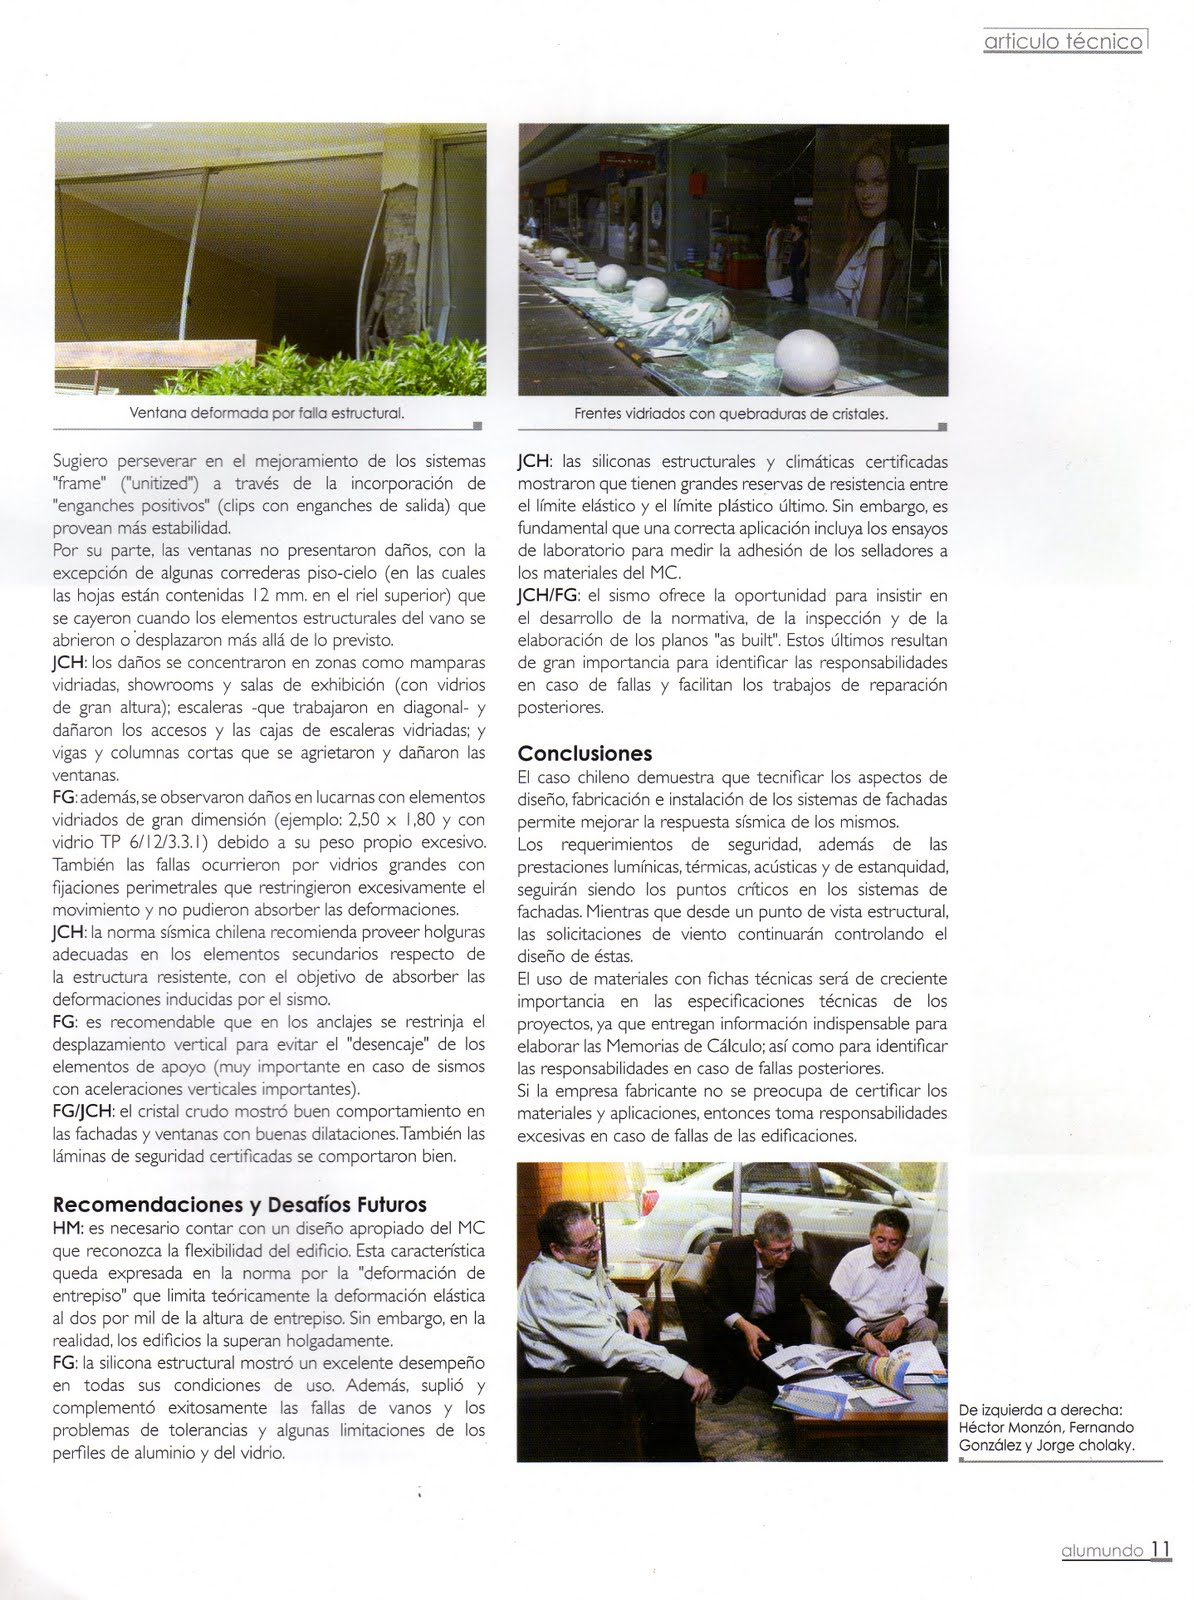 Consultoramc servicios de arquitectura e ingenieria ltda - Arquitectura e ingenieria ...